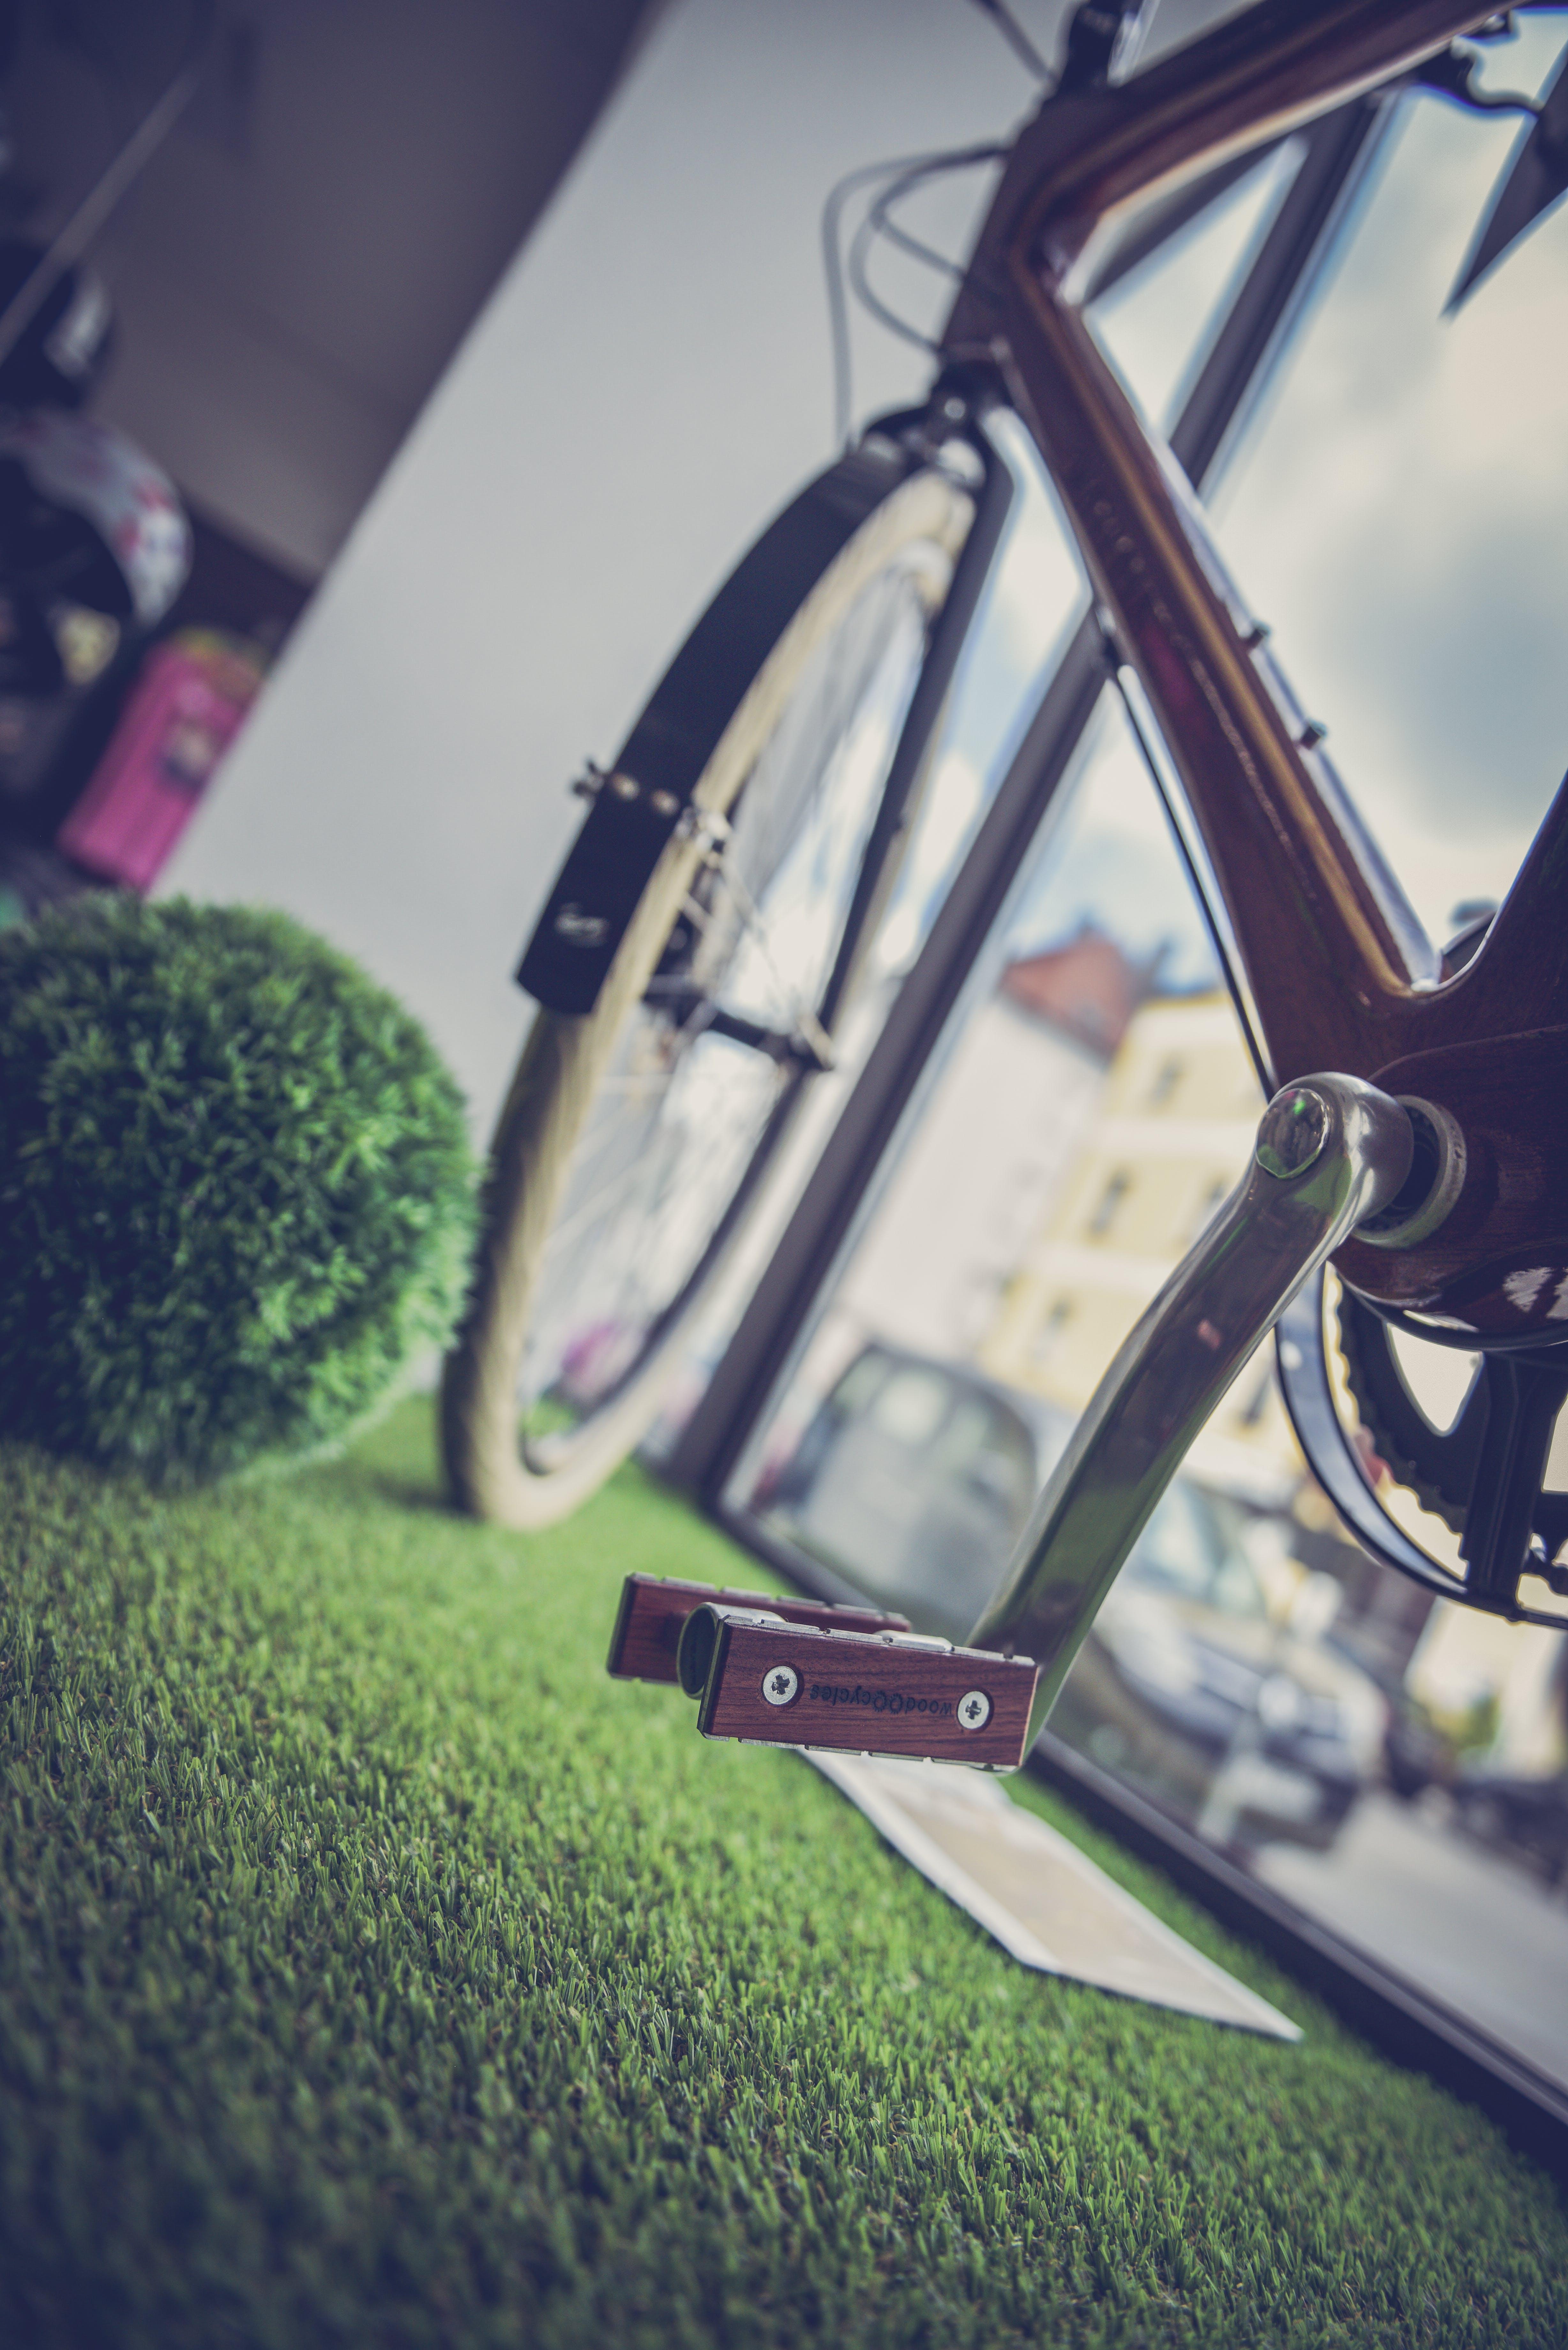 Free stock photo of wood, bike, bicycle, bicycles